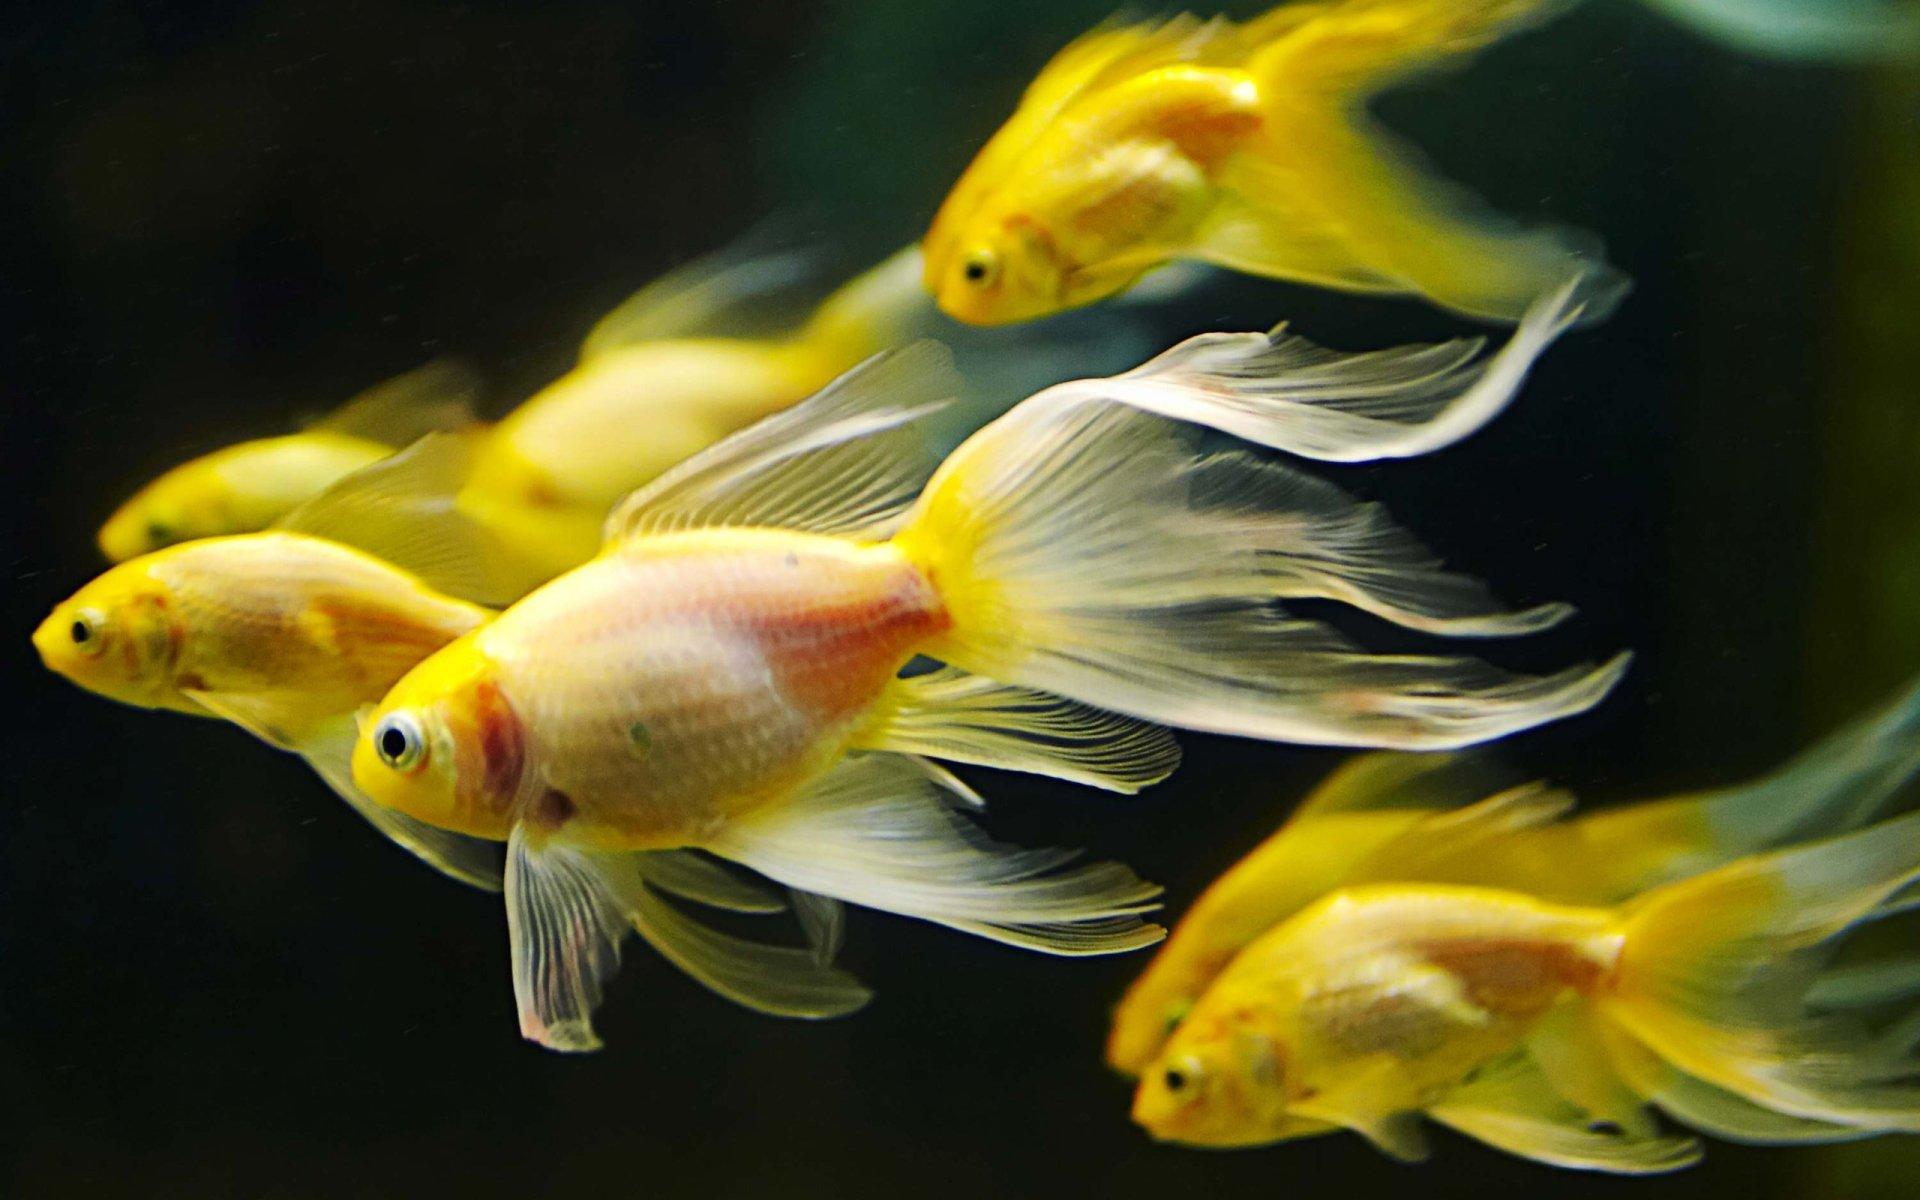 Animali - Pesce Rosso  Pesci Aquarium Sfondo